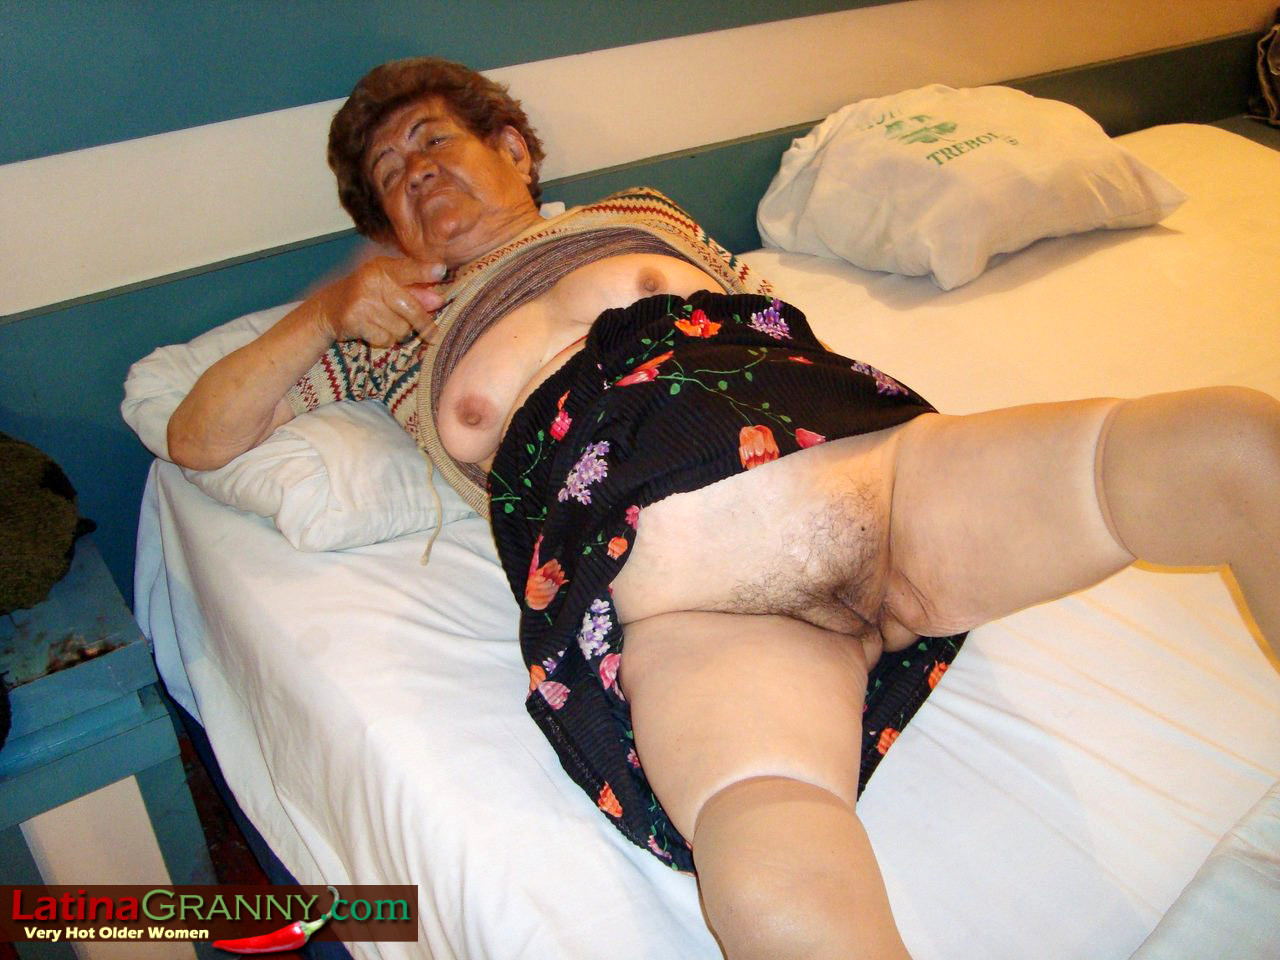 Babe Today Oma Cash Oma Pass Absolute Big Tits Vip Pics -1024